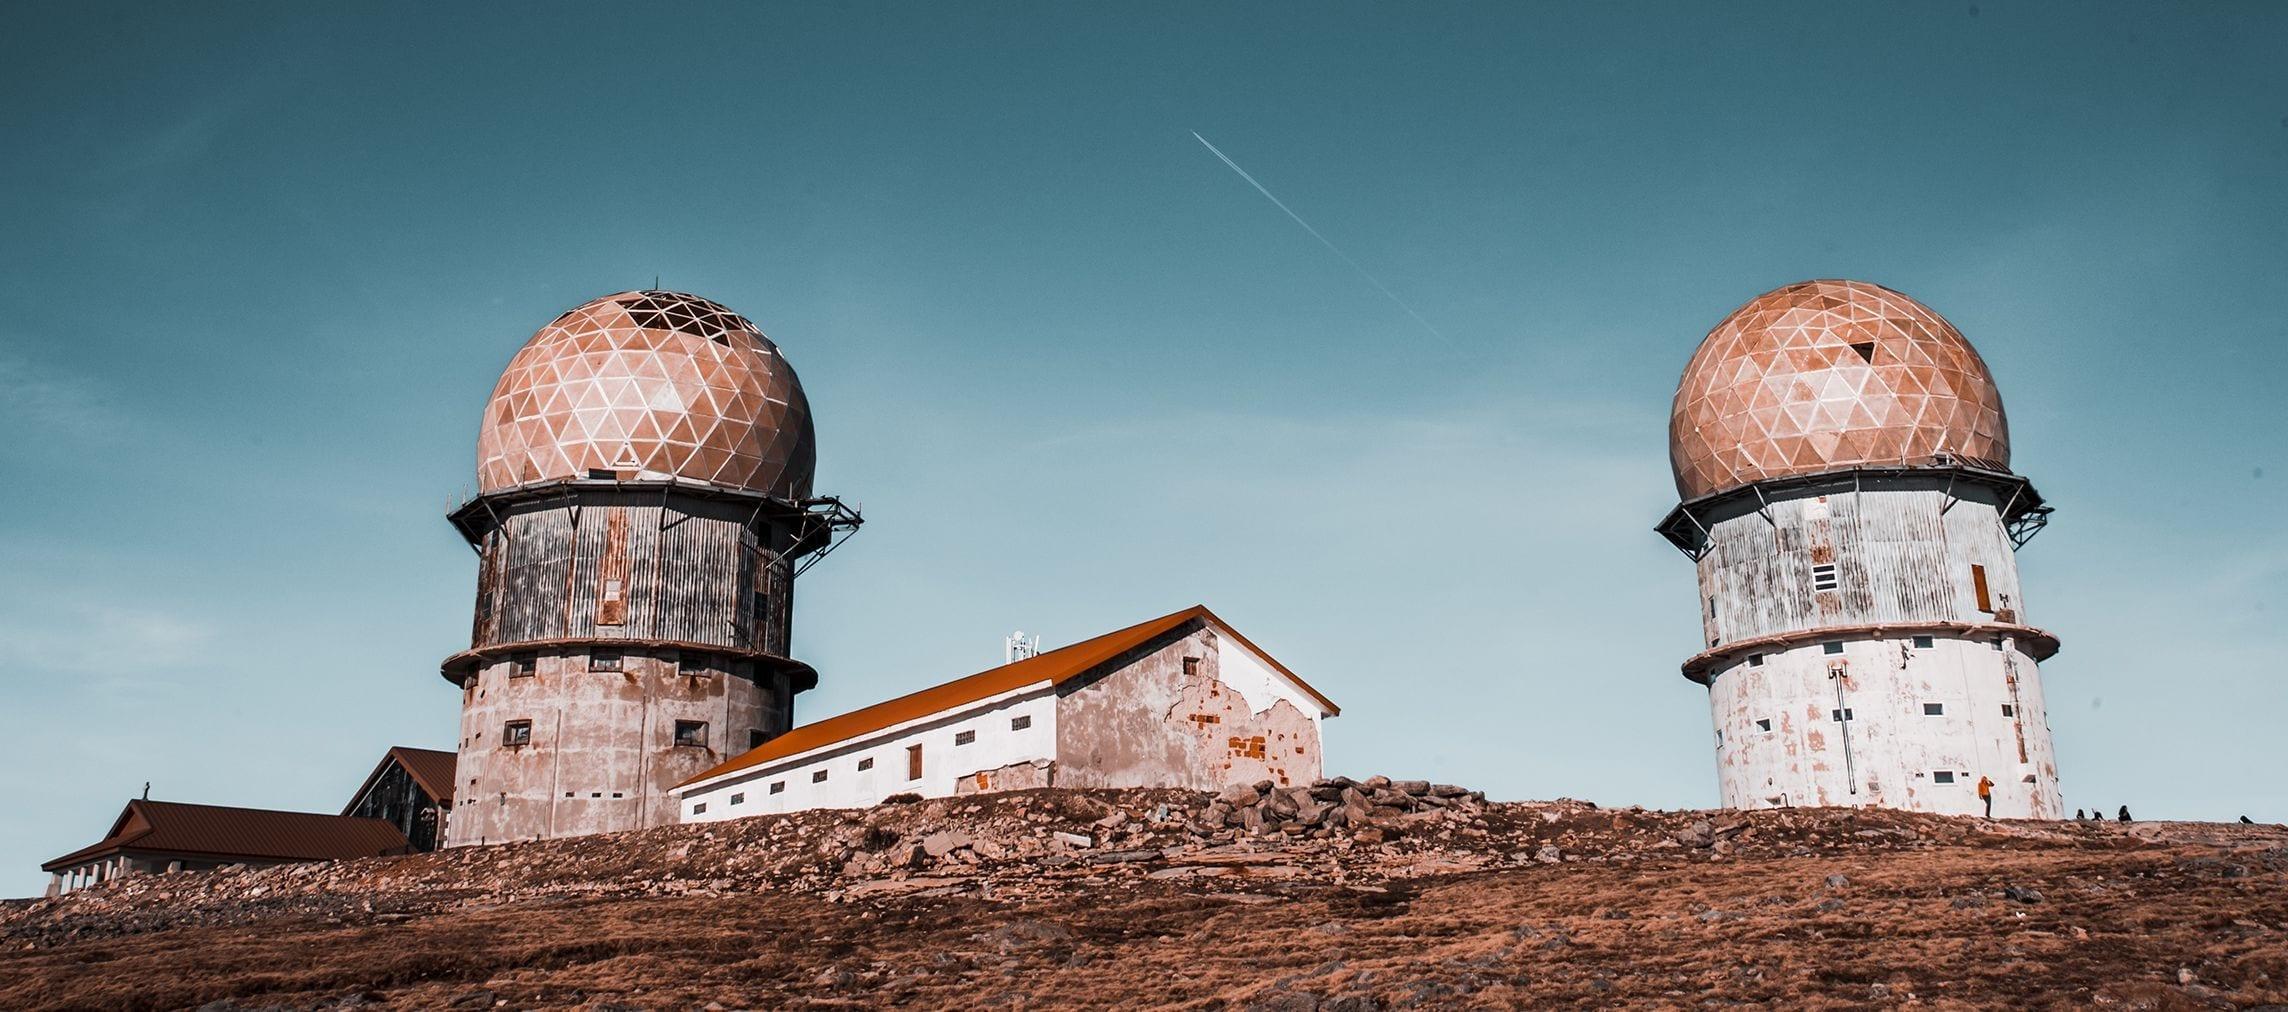 Serra da Estrela 5